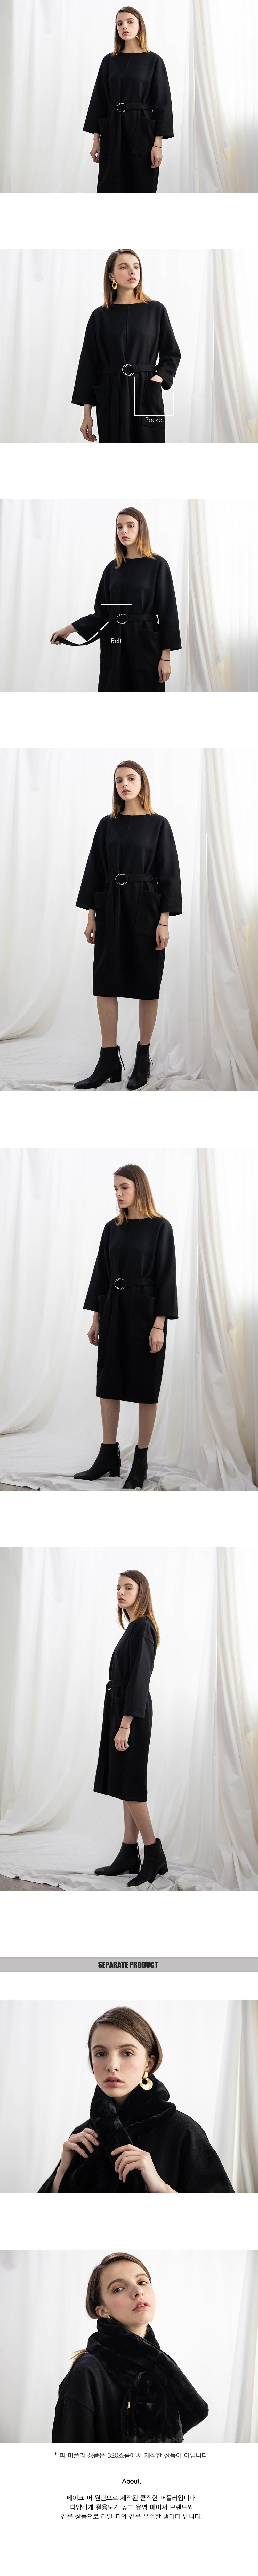 pocket-dress-black_02.jpg